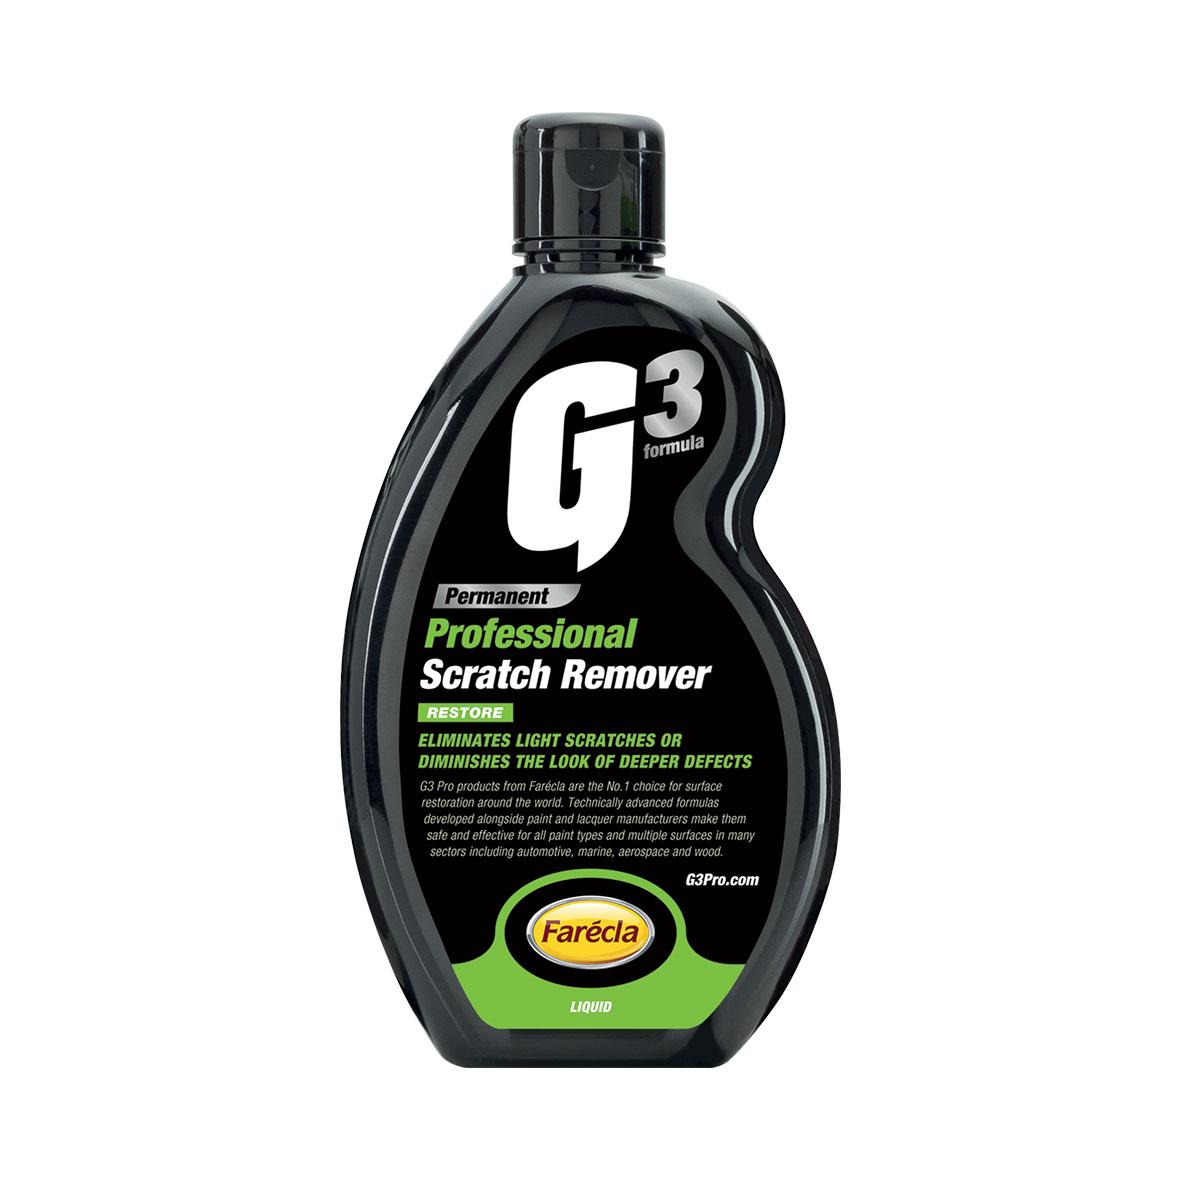 G3 Professional Scratch Remover Liquid